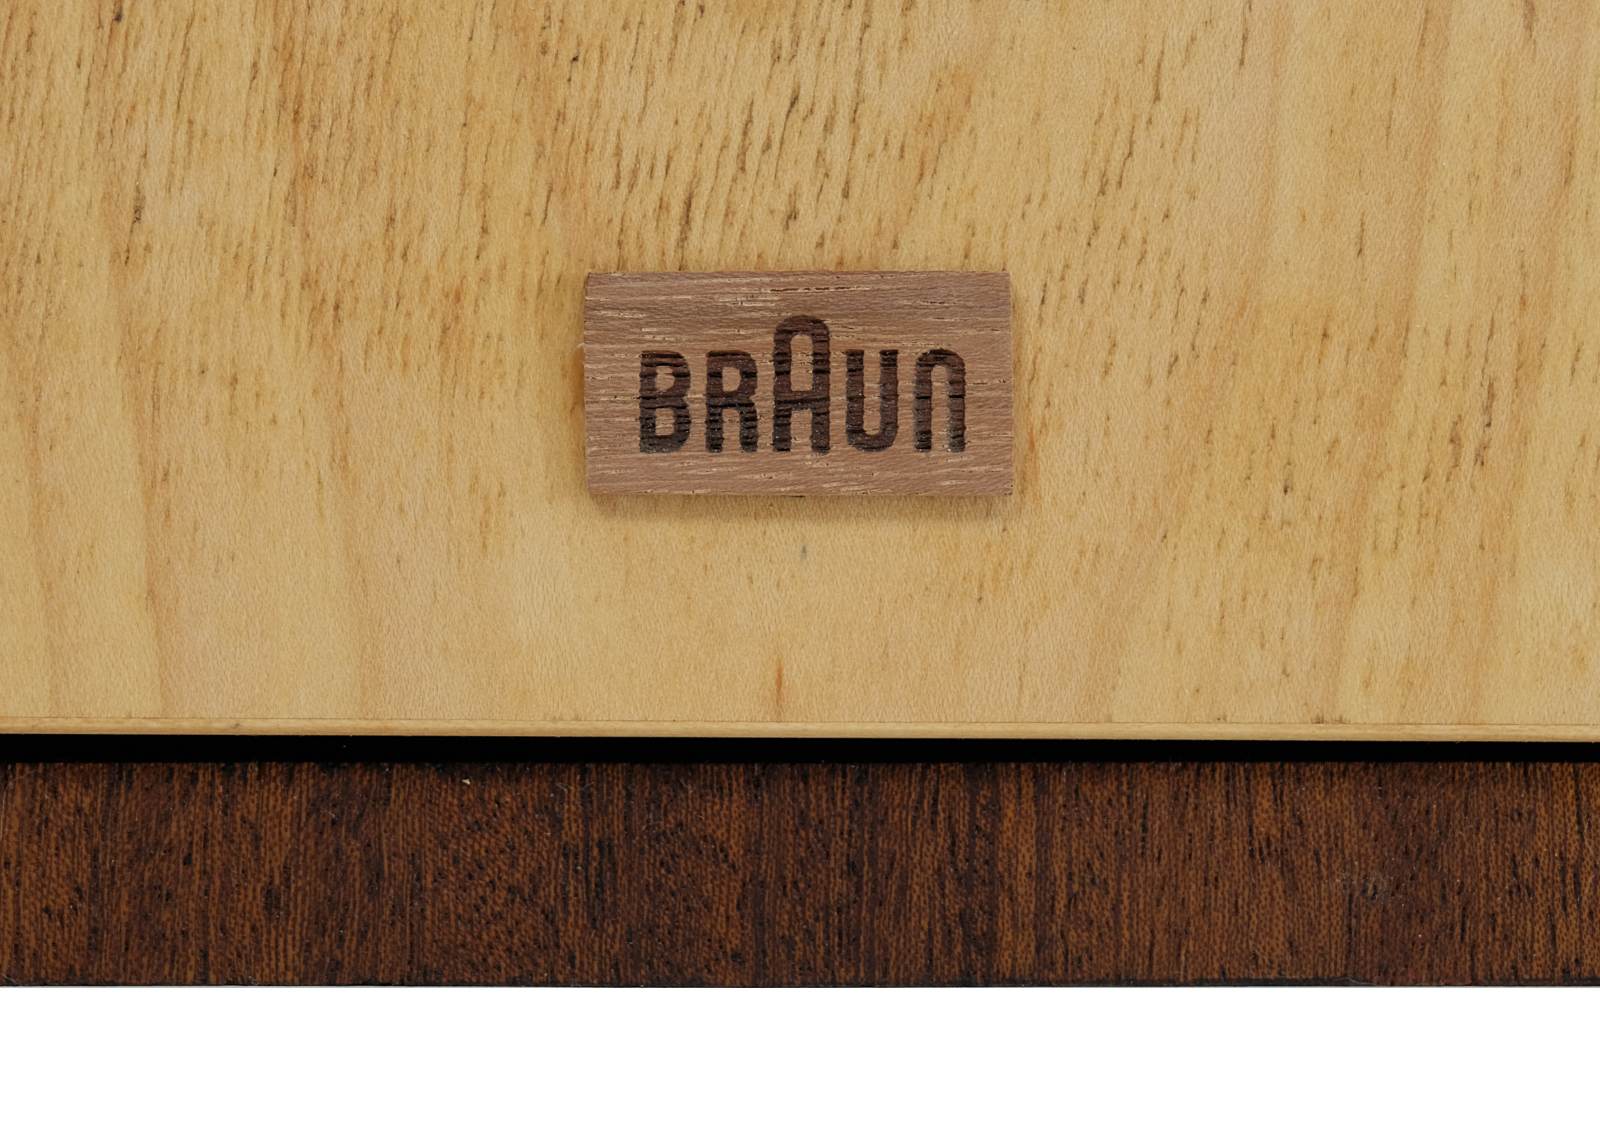 kolumny braun vintage